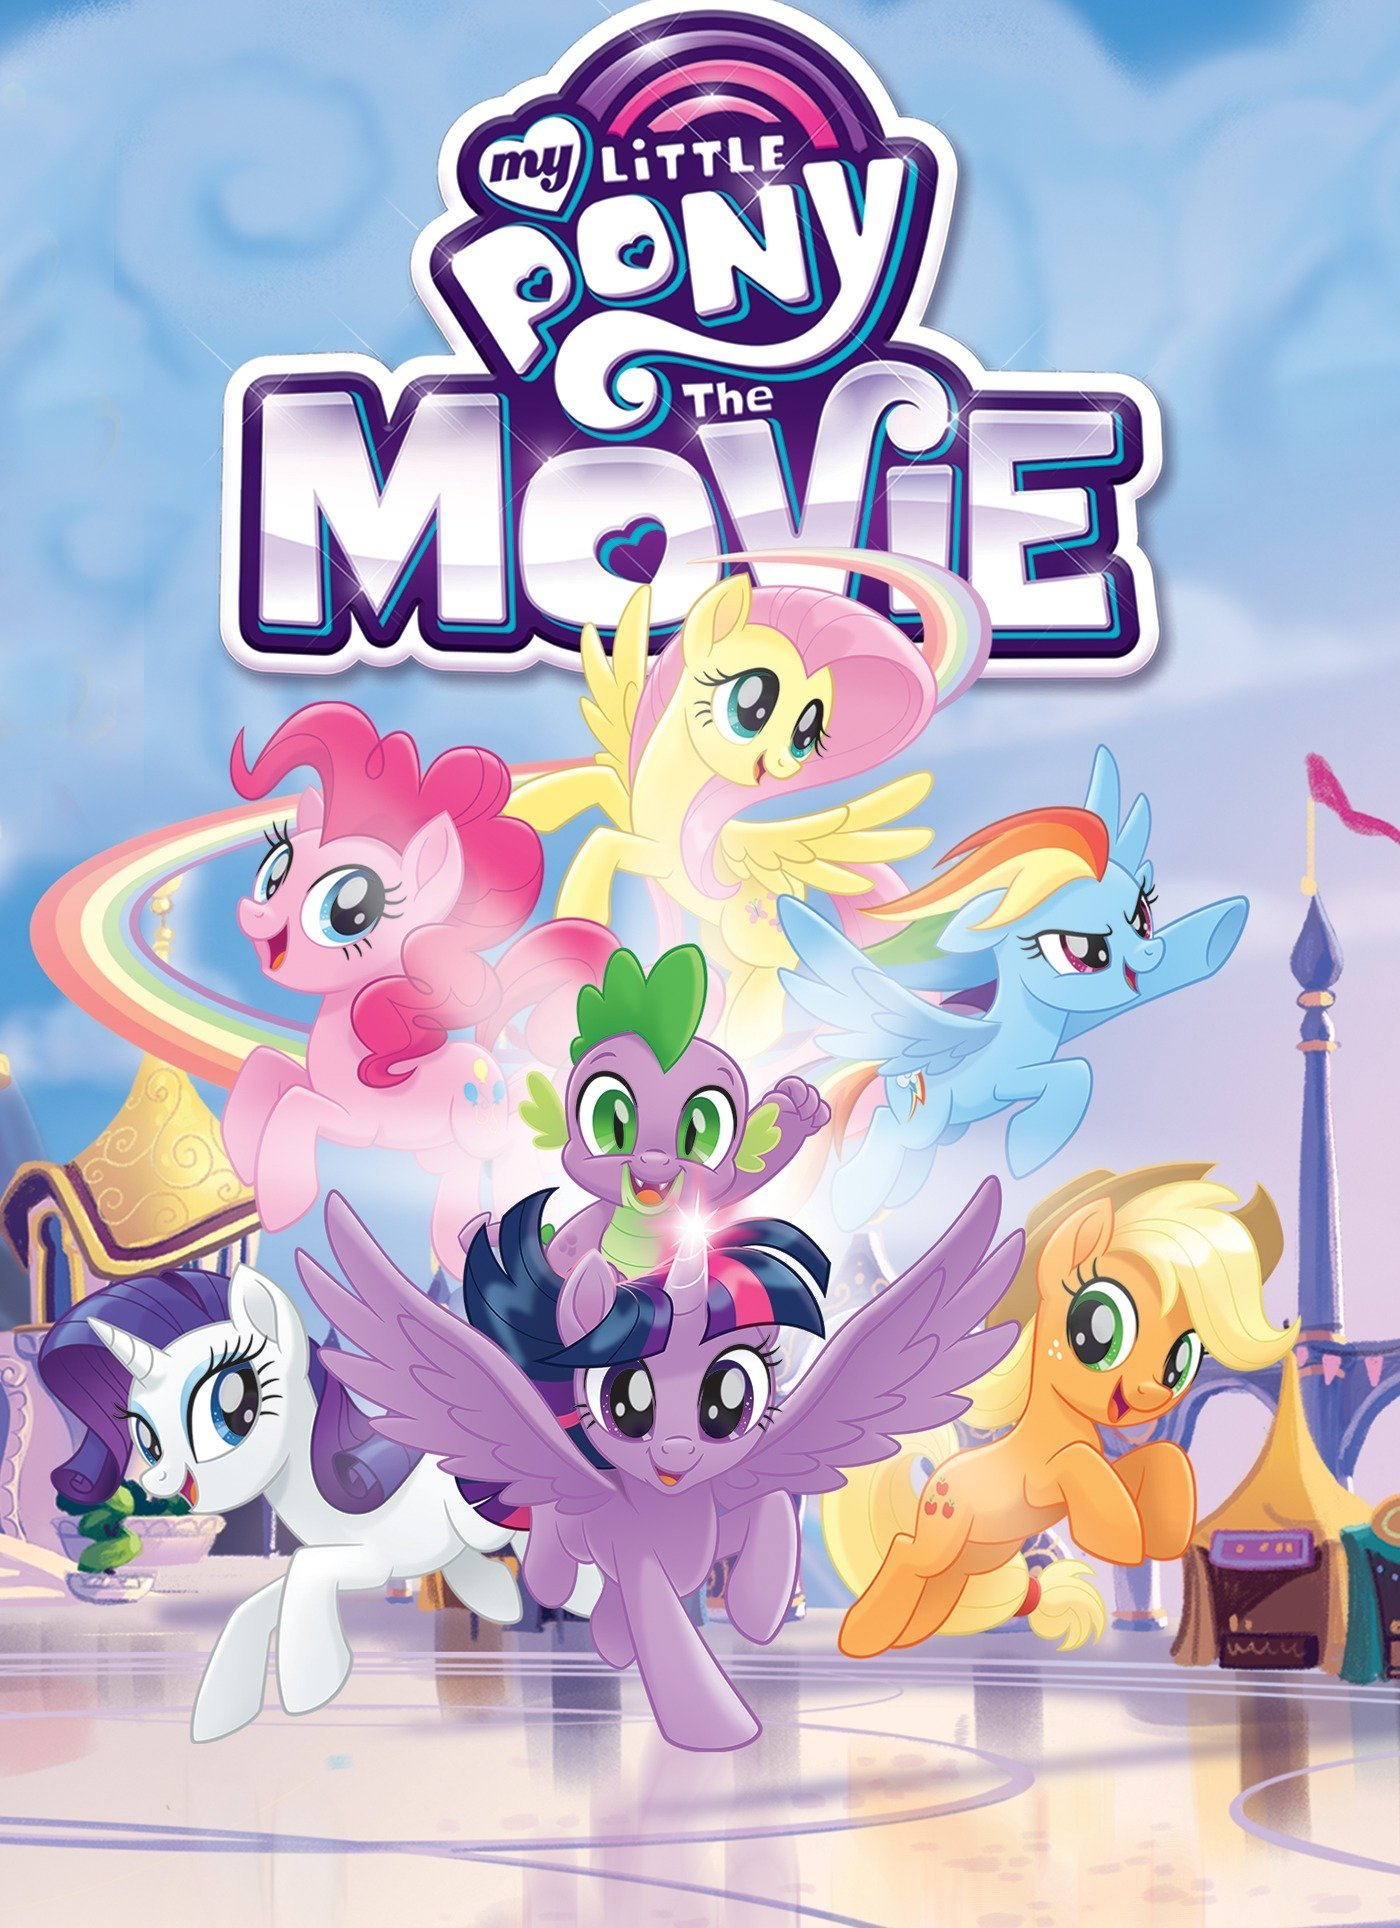 Amazon.com: My Little Pony: The Movie Adaptation (MLP The Movie) (9781684051168): Eisinger, Justin, McCarthy, Meghan, Hsiao, Rita: Books